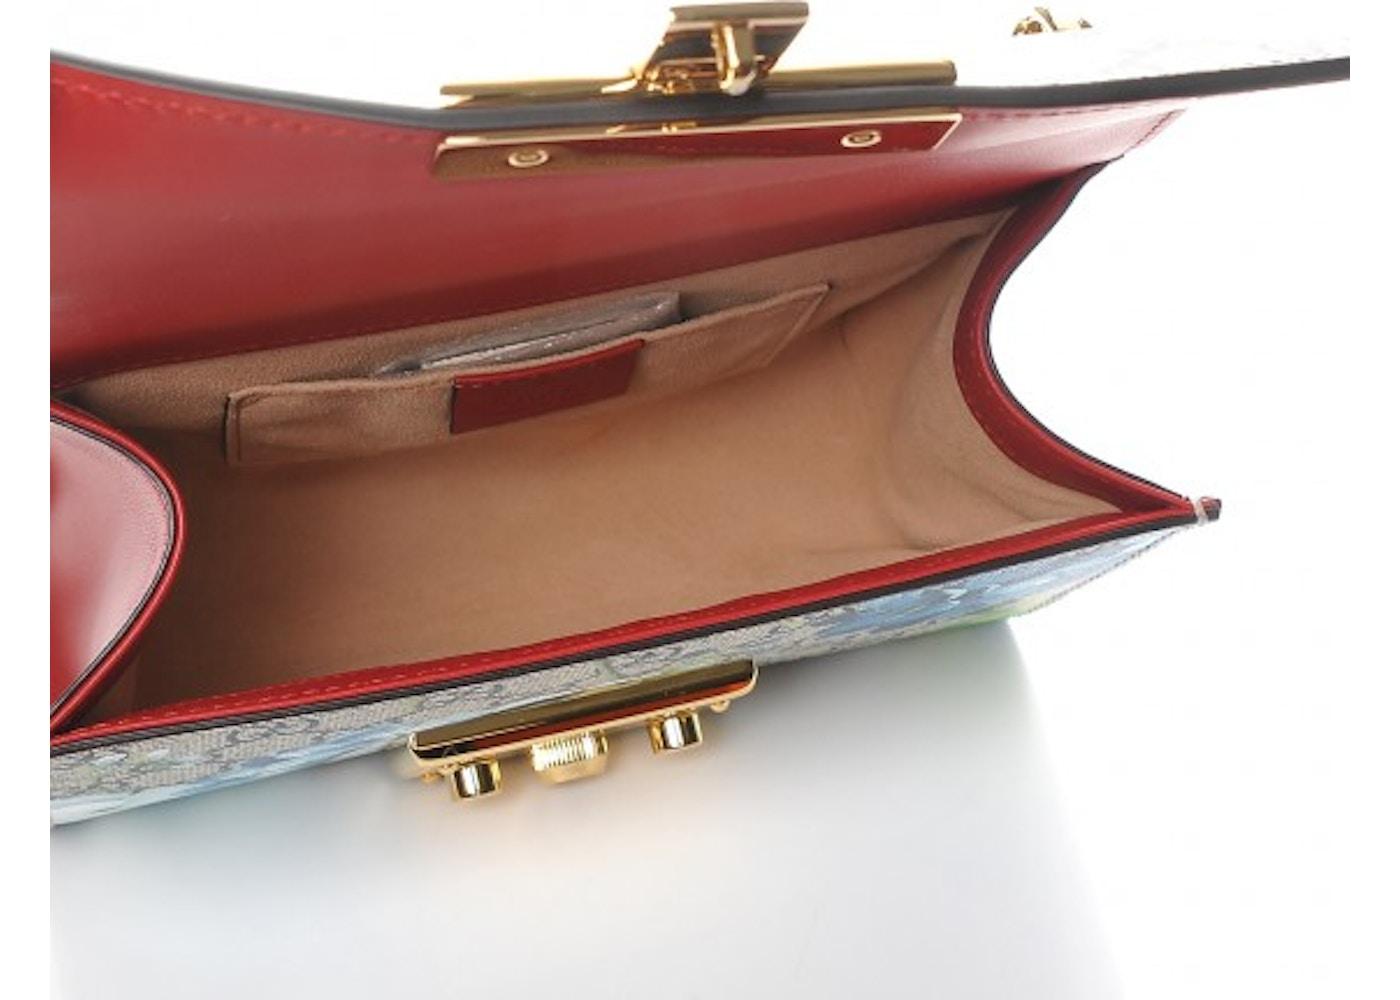 623d09260c4cc3 Gucci Padlock Shoulder Bag Blooms GG Supreme Small Blue/Red/Beige